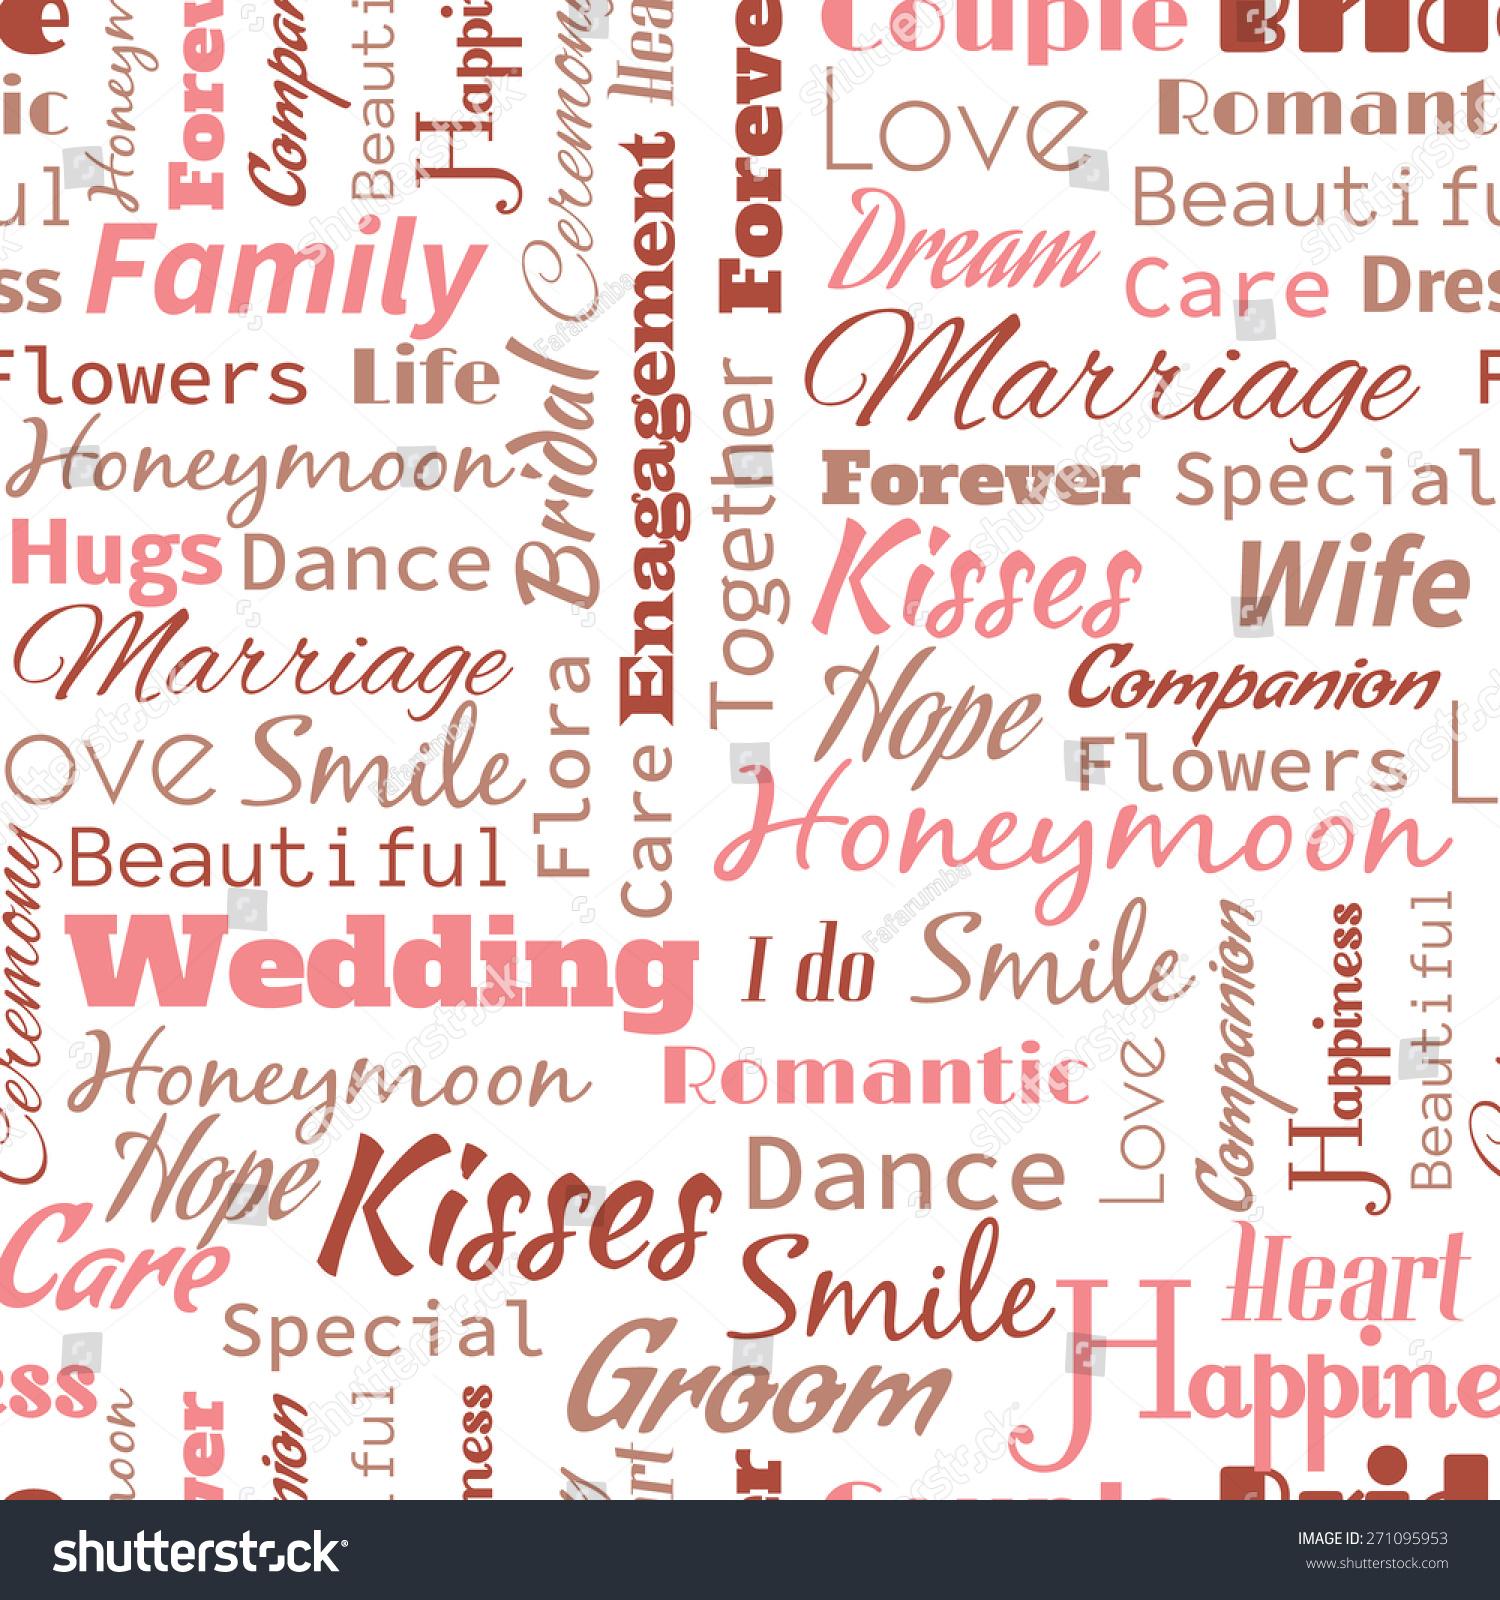 Wedding Or Honeymoon Text Word Seamless Pattern Metaphor To Family Wife Kiss